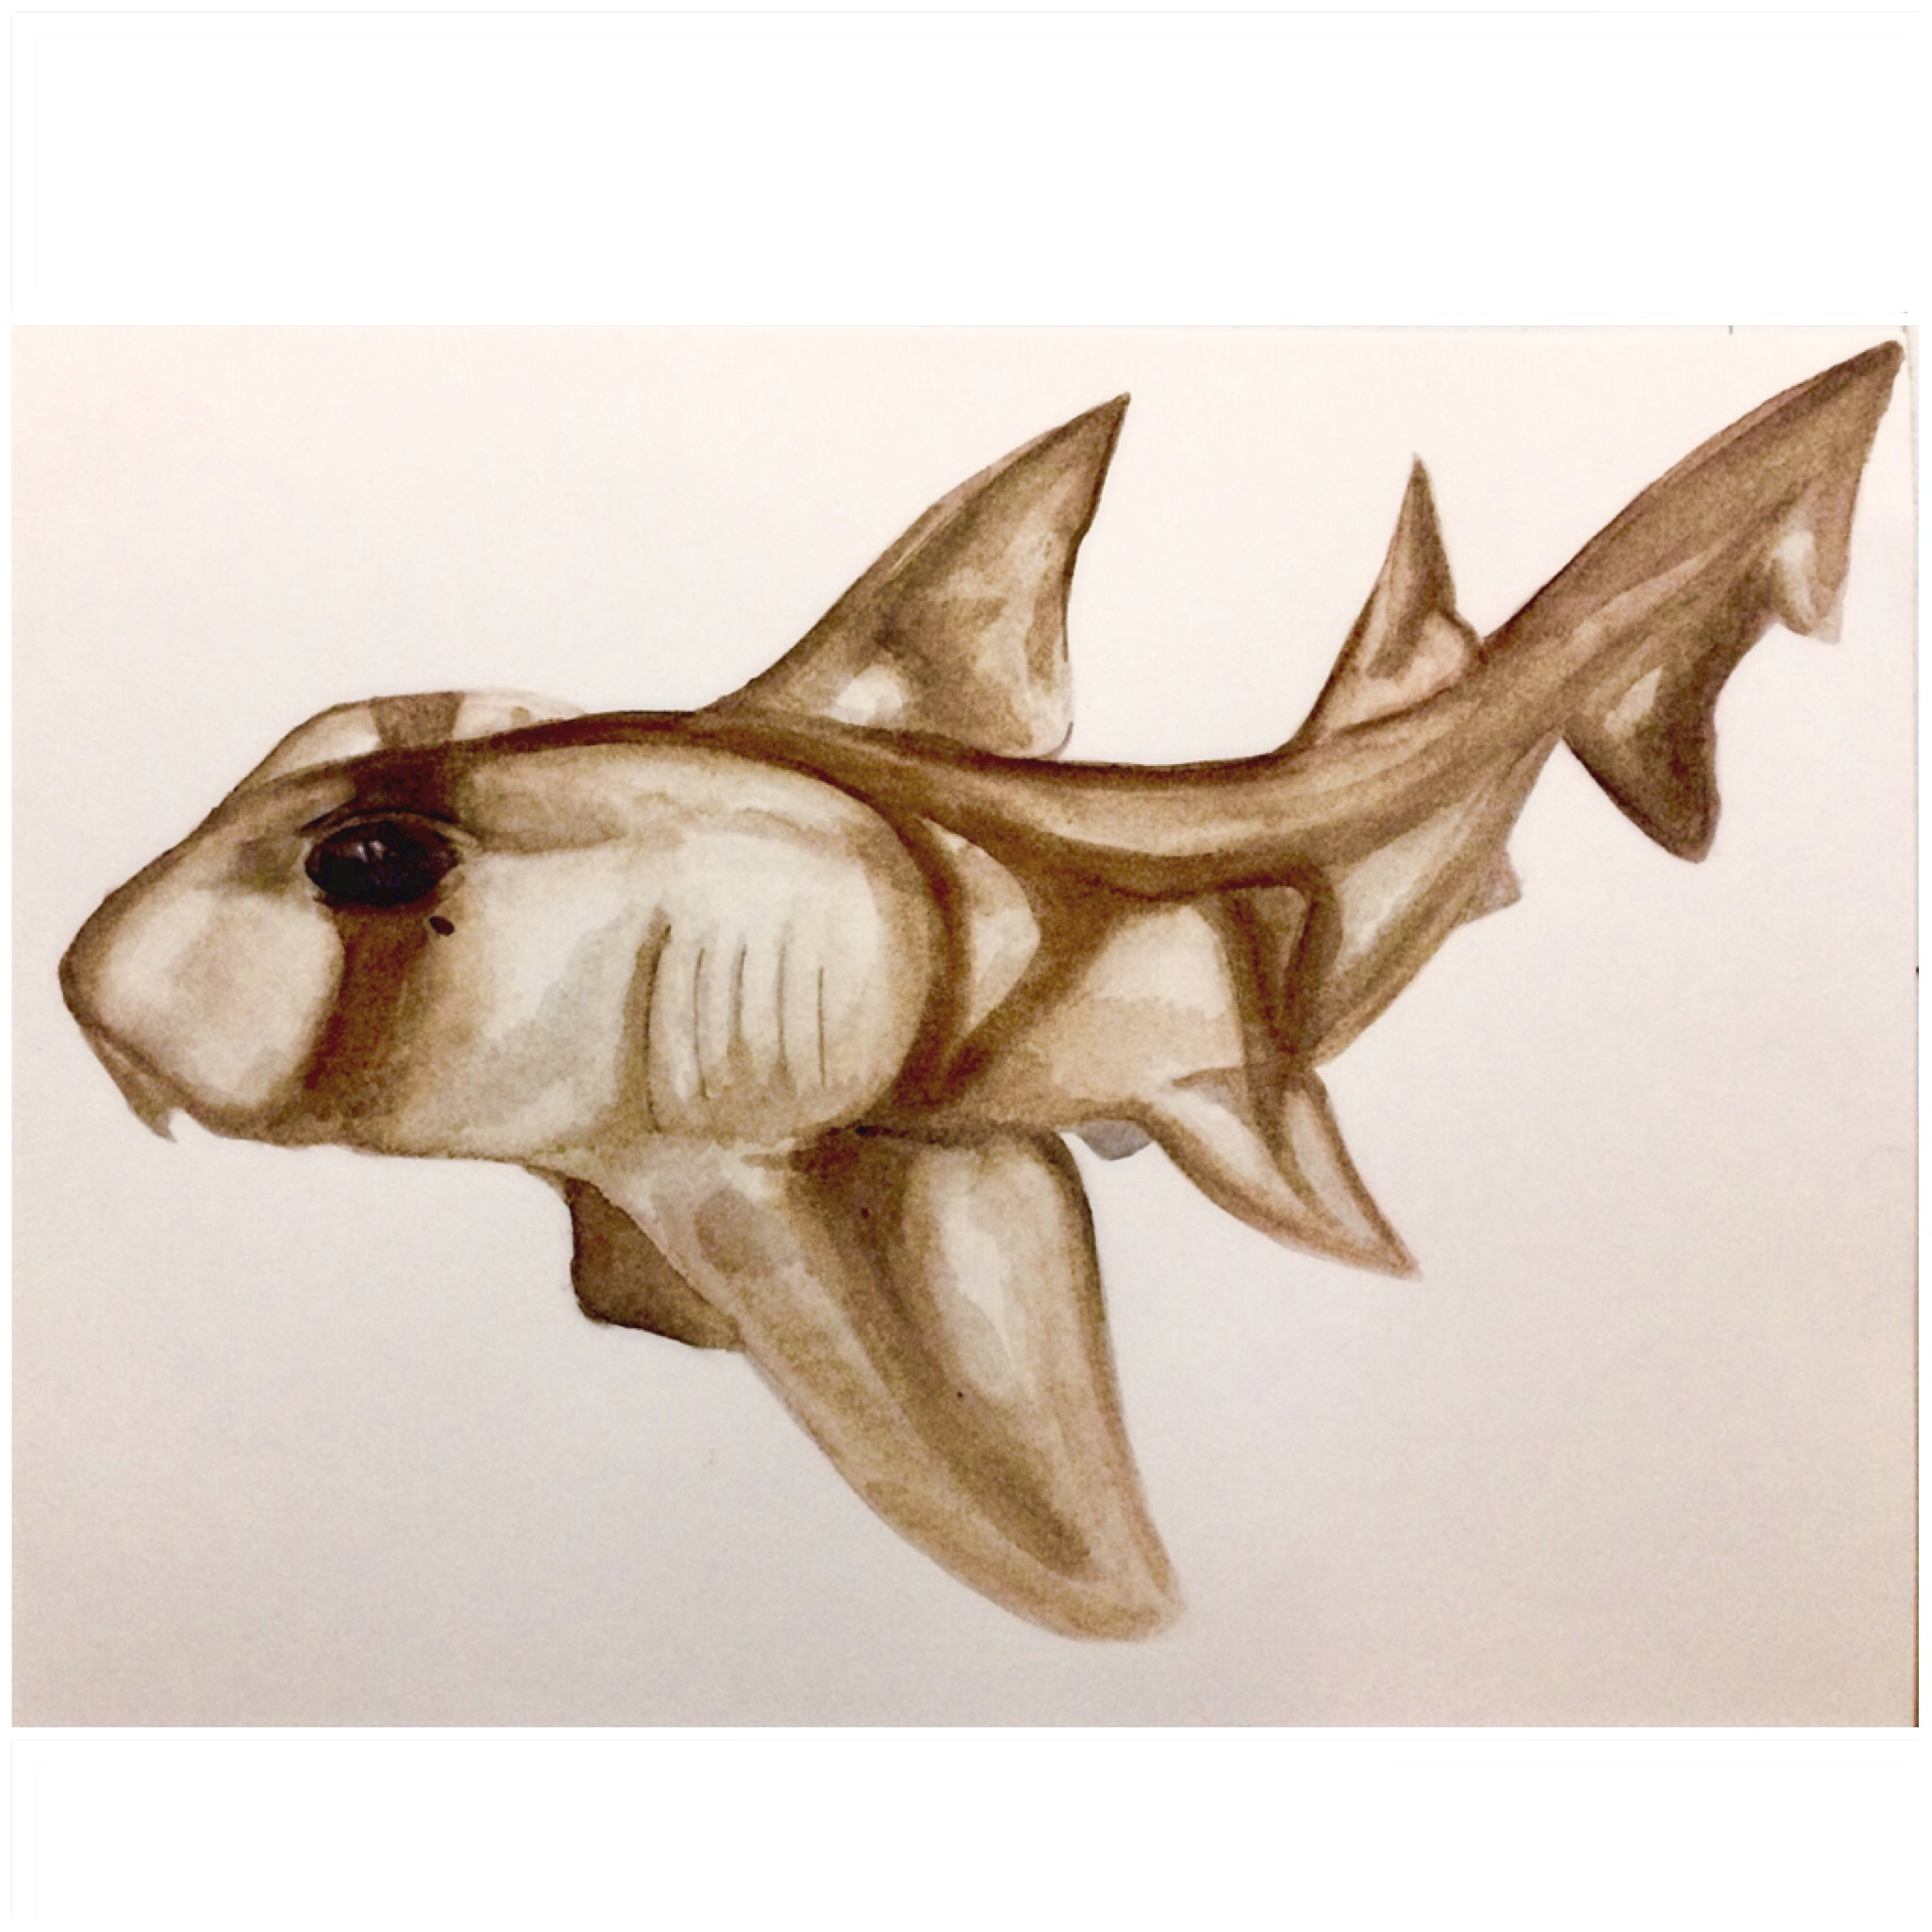 19/365 Port Jackson Shark